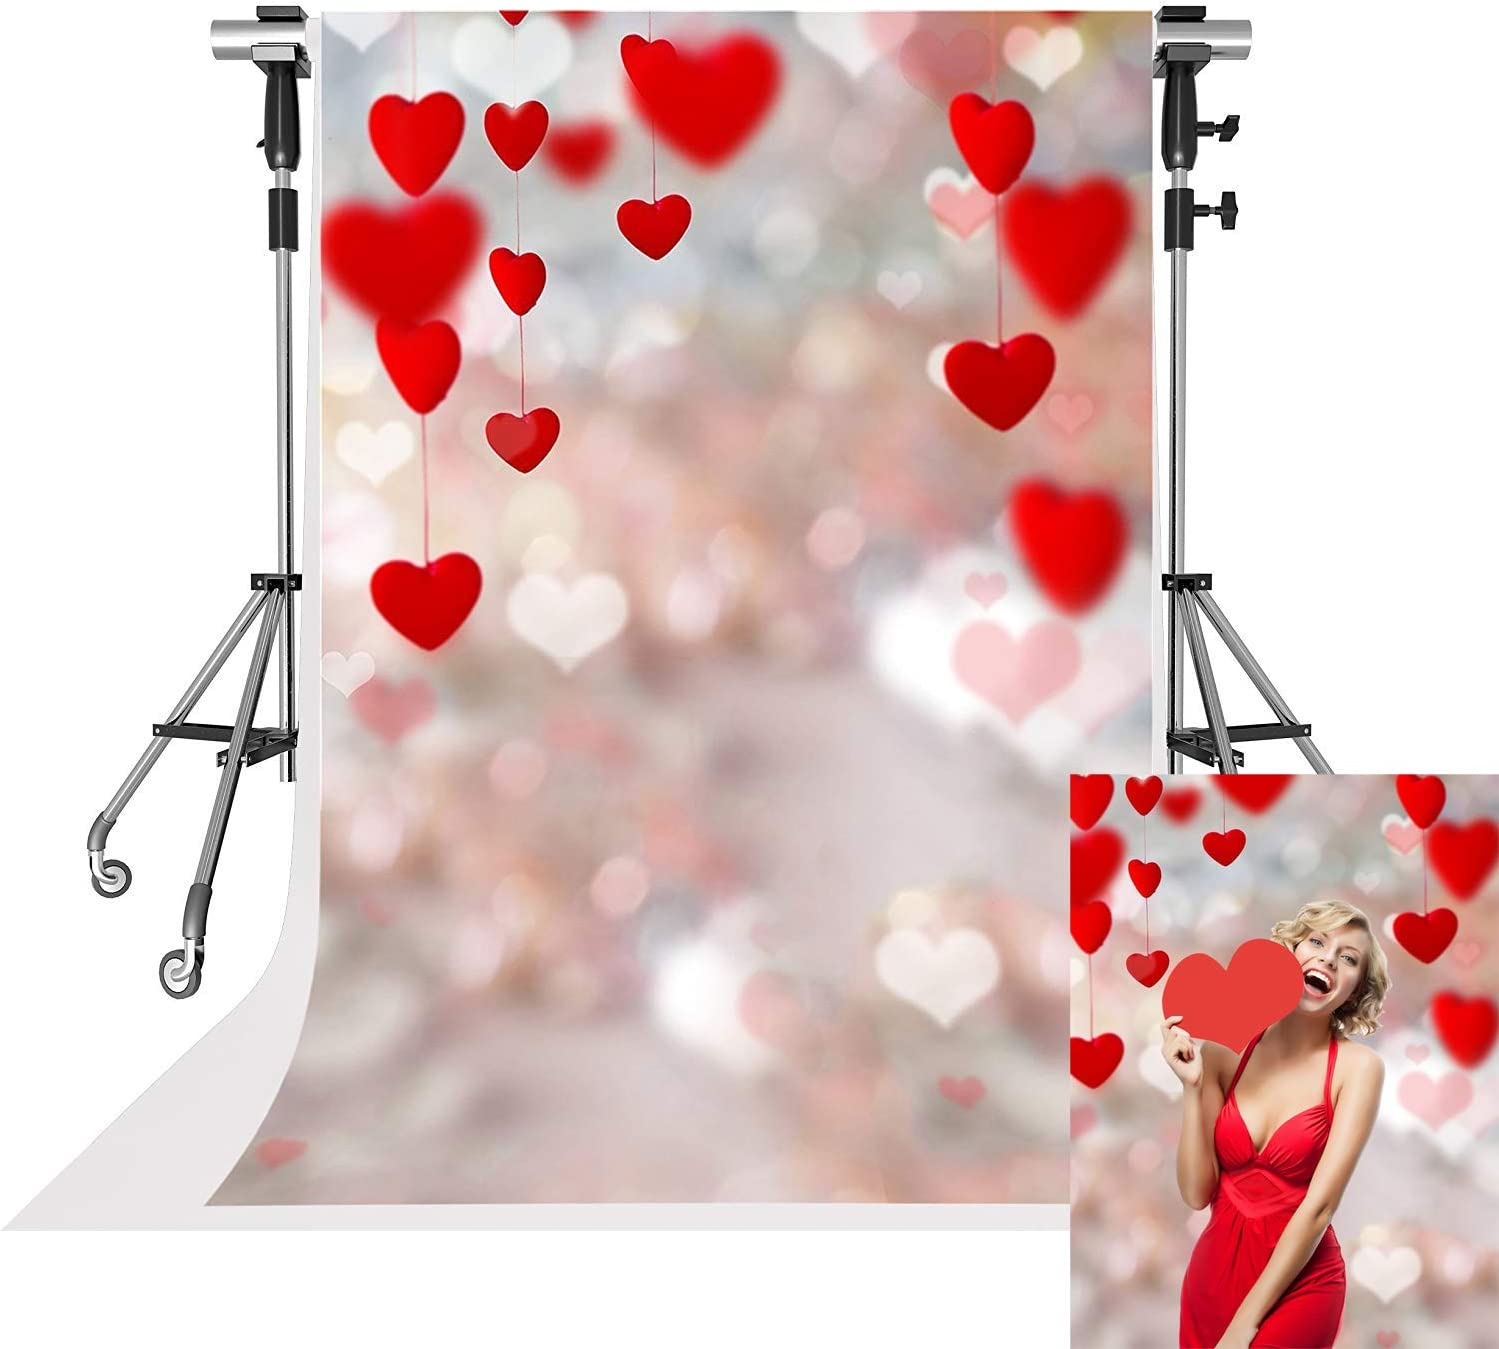 10x10ft Happy Valentines Day Backdrop Hot Air Balloon Graffiti Grunge Brick Wall Photography Background Wallpaper Decor Birthday Wedding Kids Lover Adults Artistic Portrait Studio Props